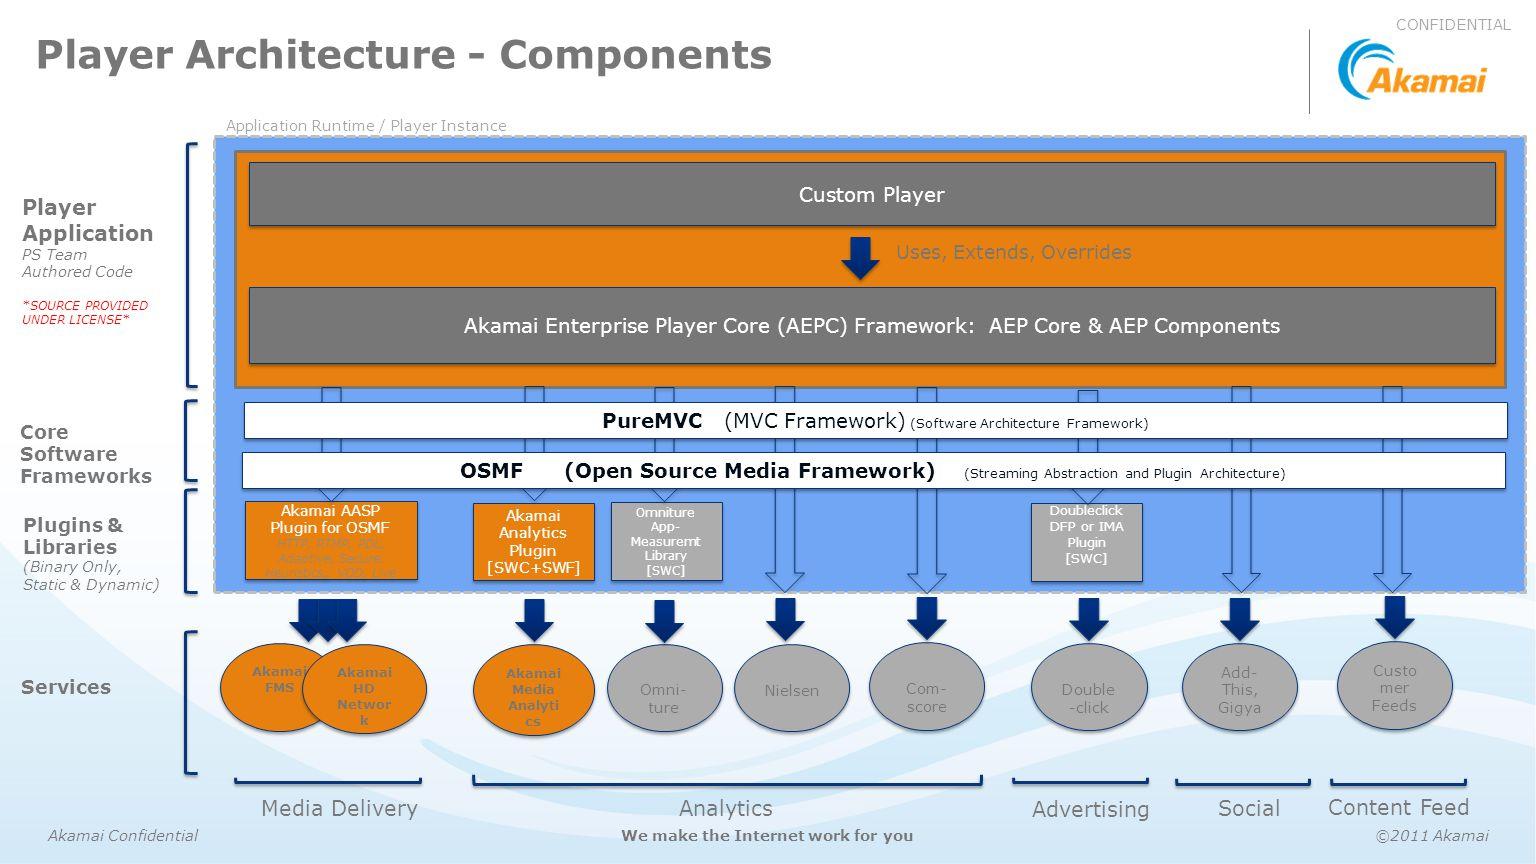 Akamai Confidential©2011 AkamaiWe make the Internet work for you Akamai AASP Plugin for OSMF HTTP, RTMP, PDL, Adaptive, Secure, Heuristics,, VOD, Live